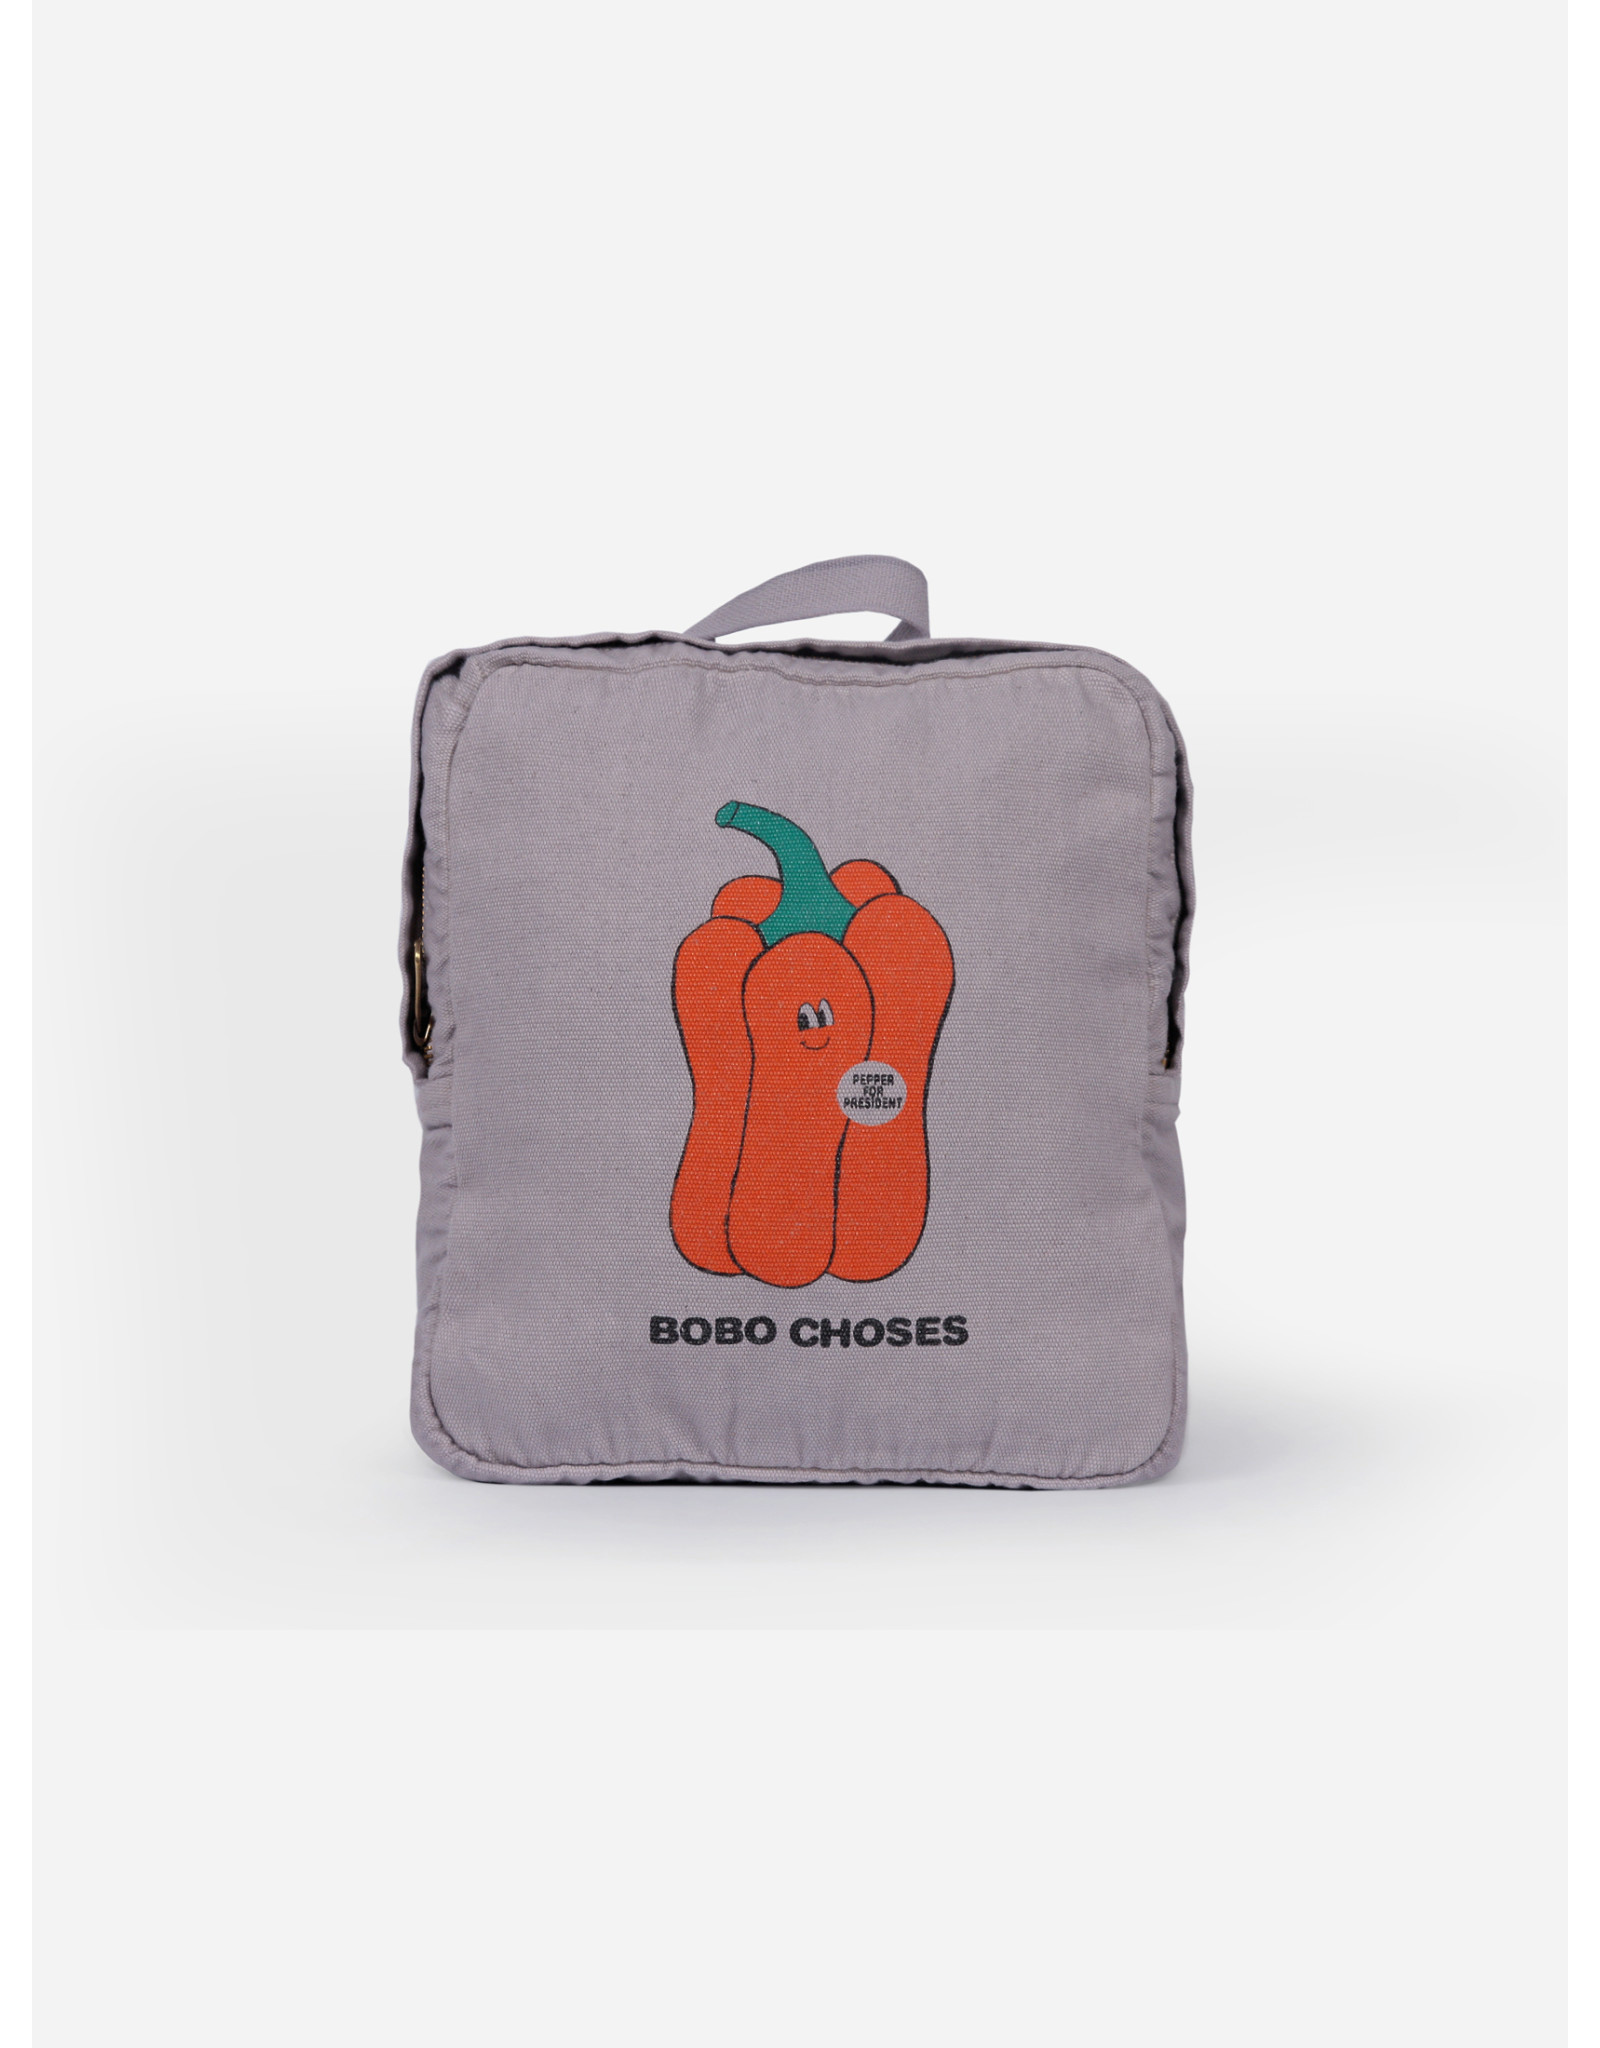 Bobo Choses Vote For Pepper School Bag